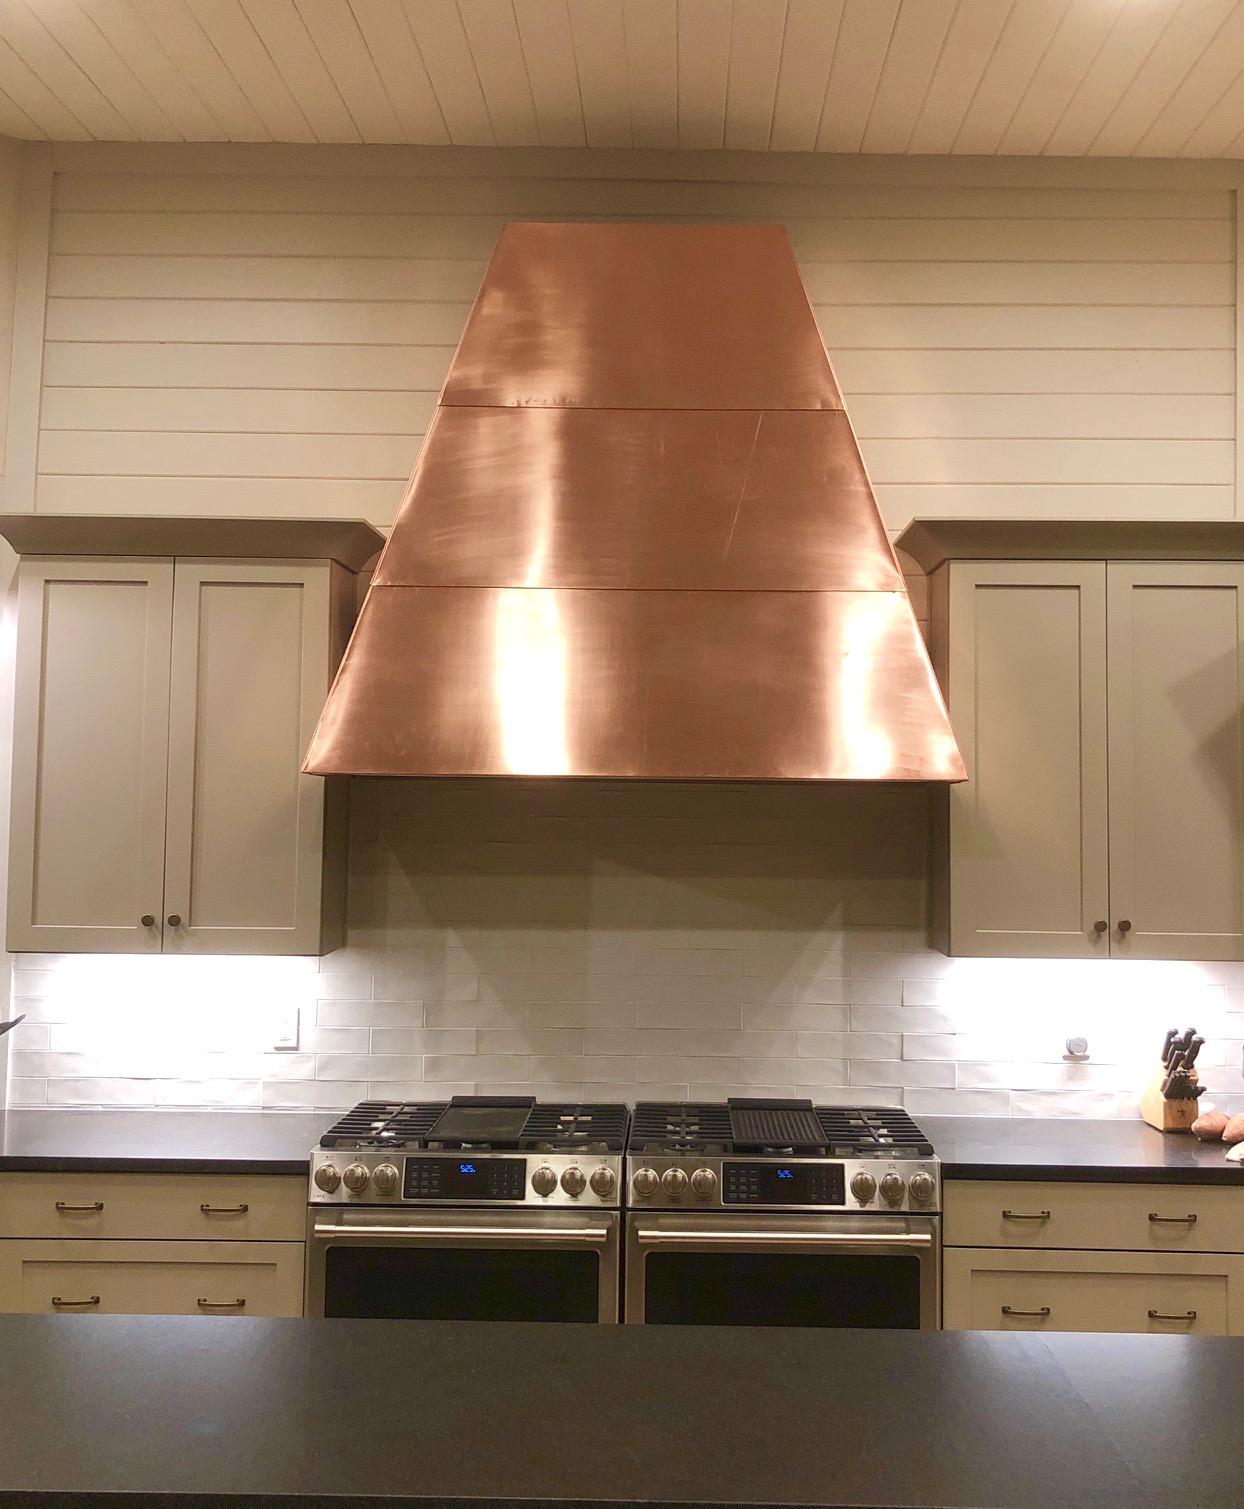 Kitchen Designed by Katrina Porter Designs. Photographed by Paula Coldiron.